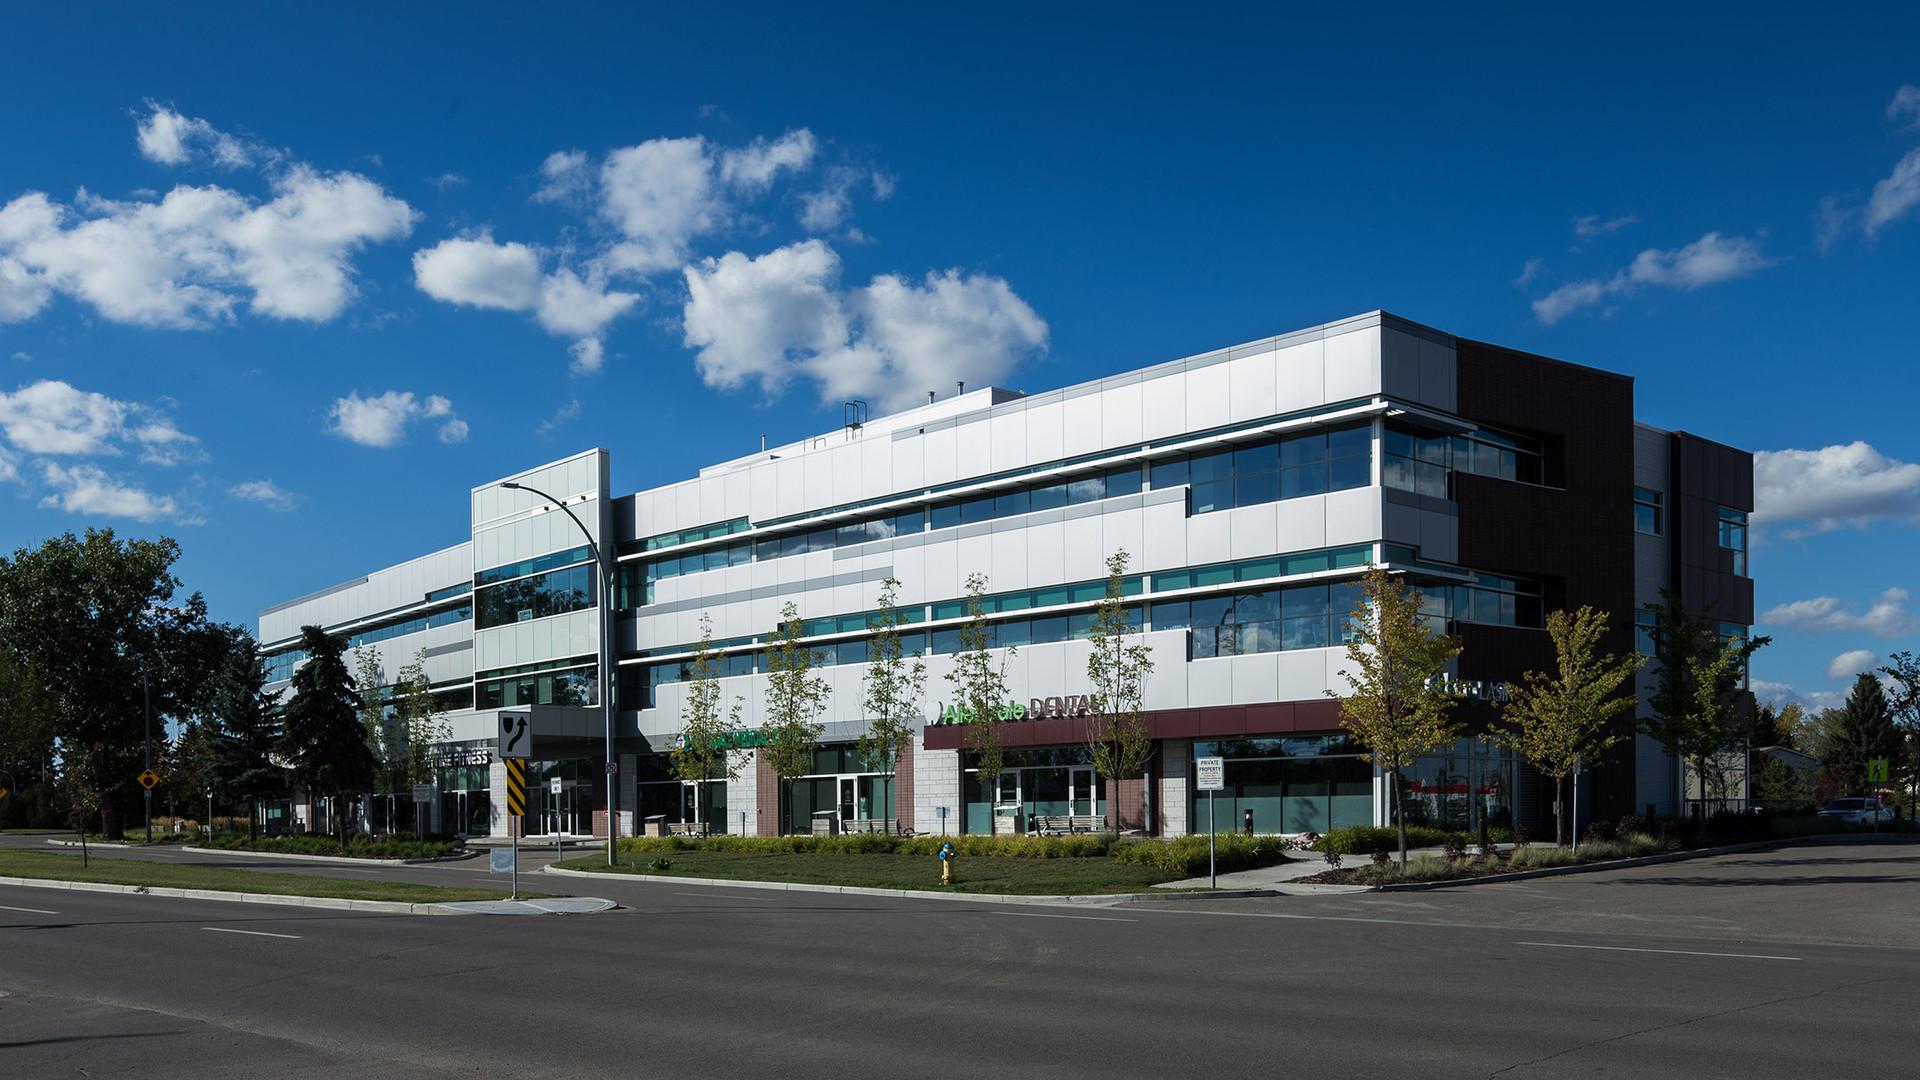 Allendale Office Plaza